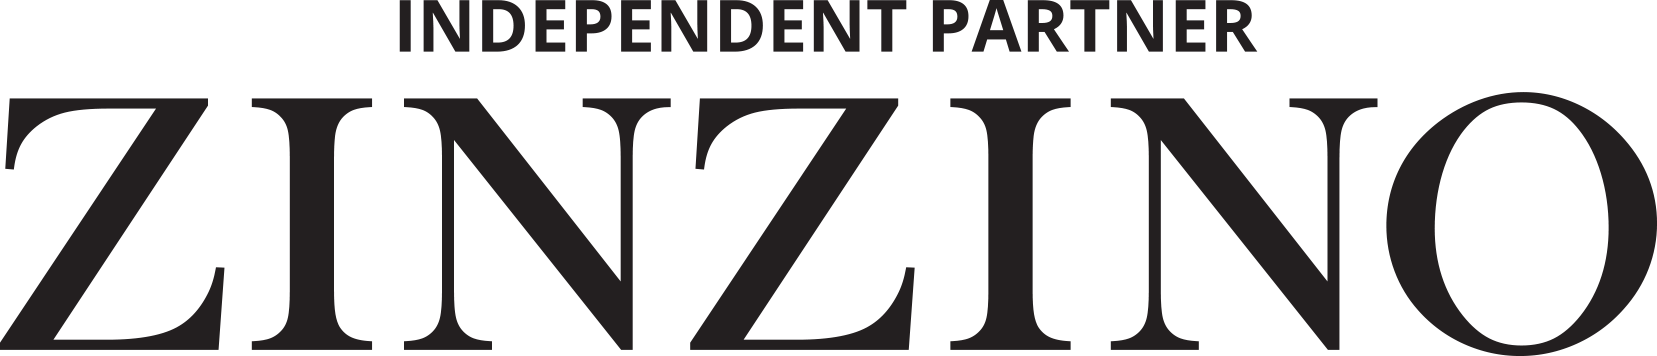 zinzino flexity partner